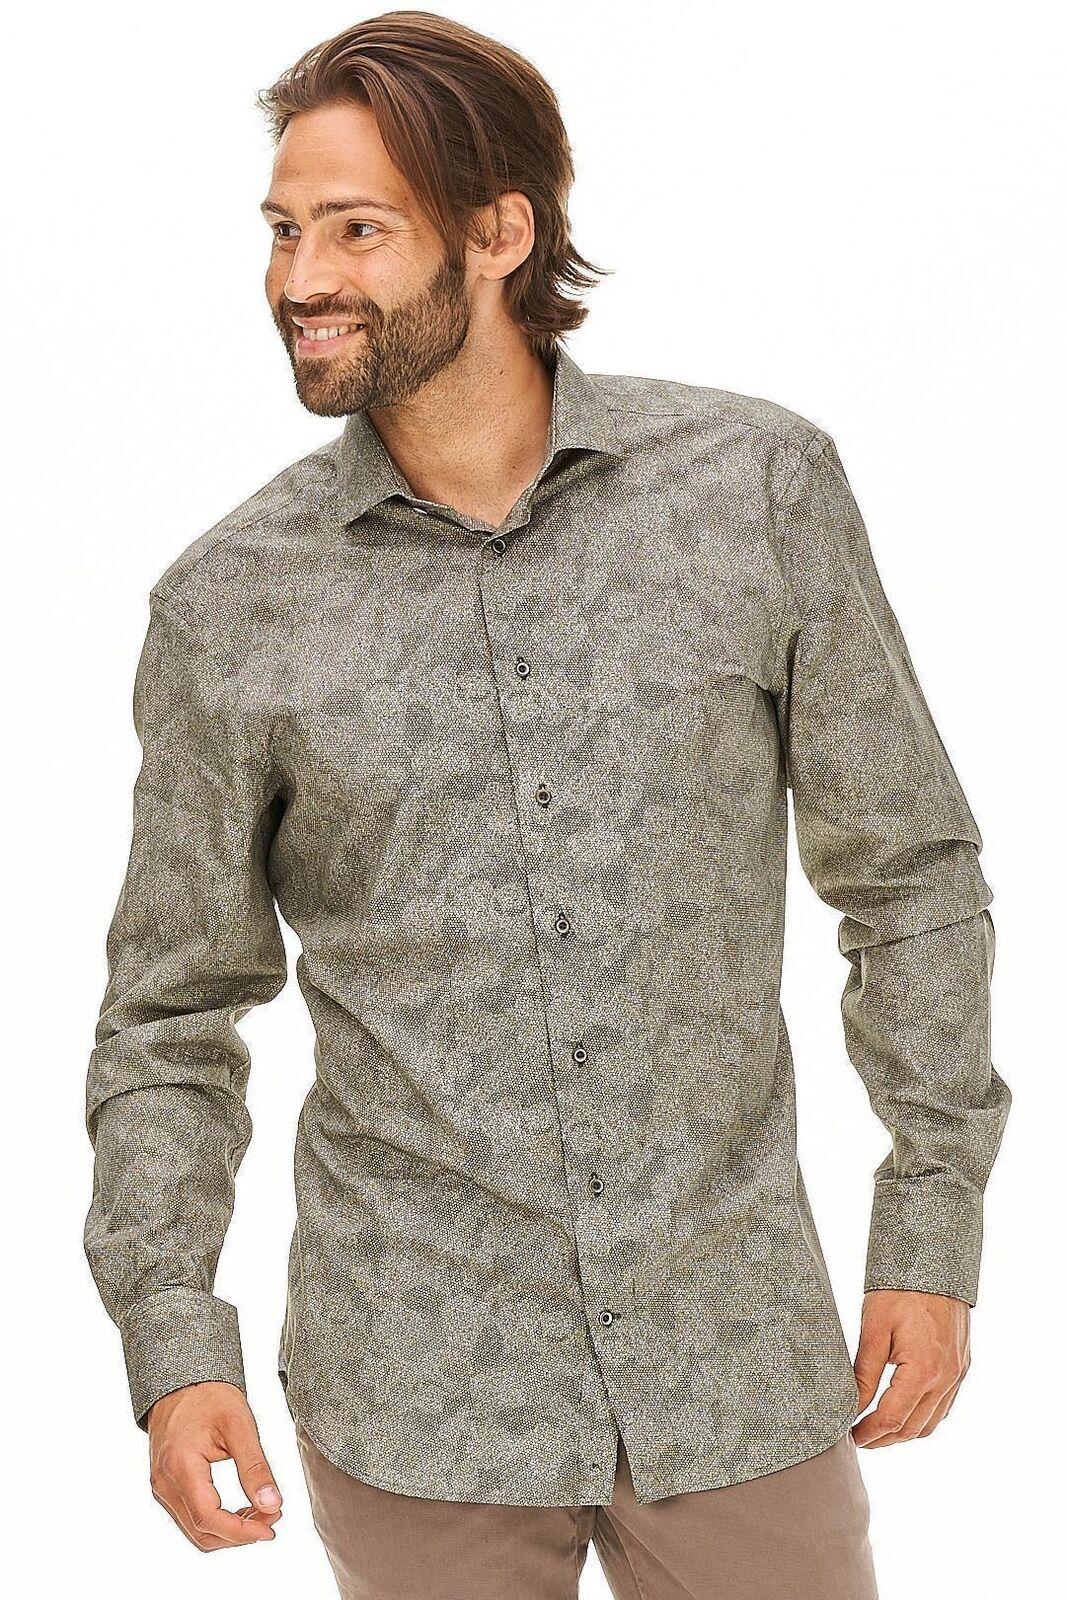 Cavallaro Napoli - Hemd Spito Herre camouflage Designer Neu